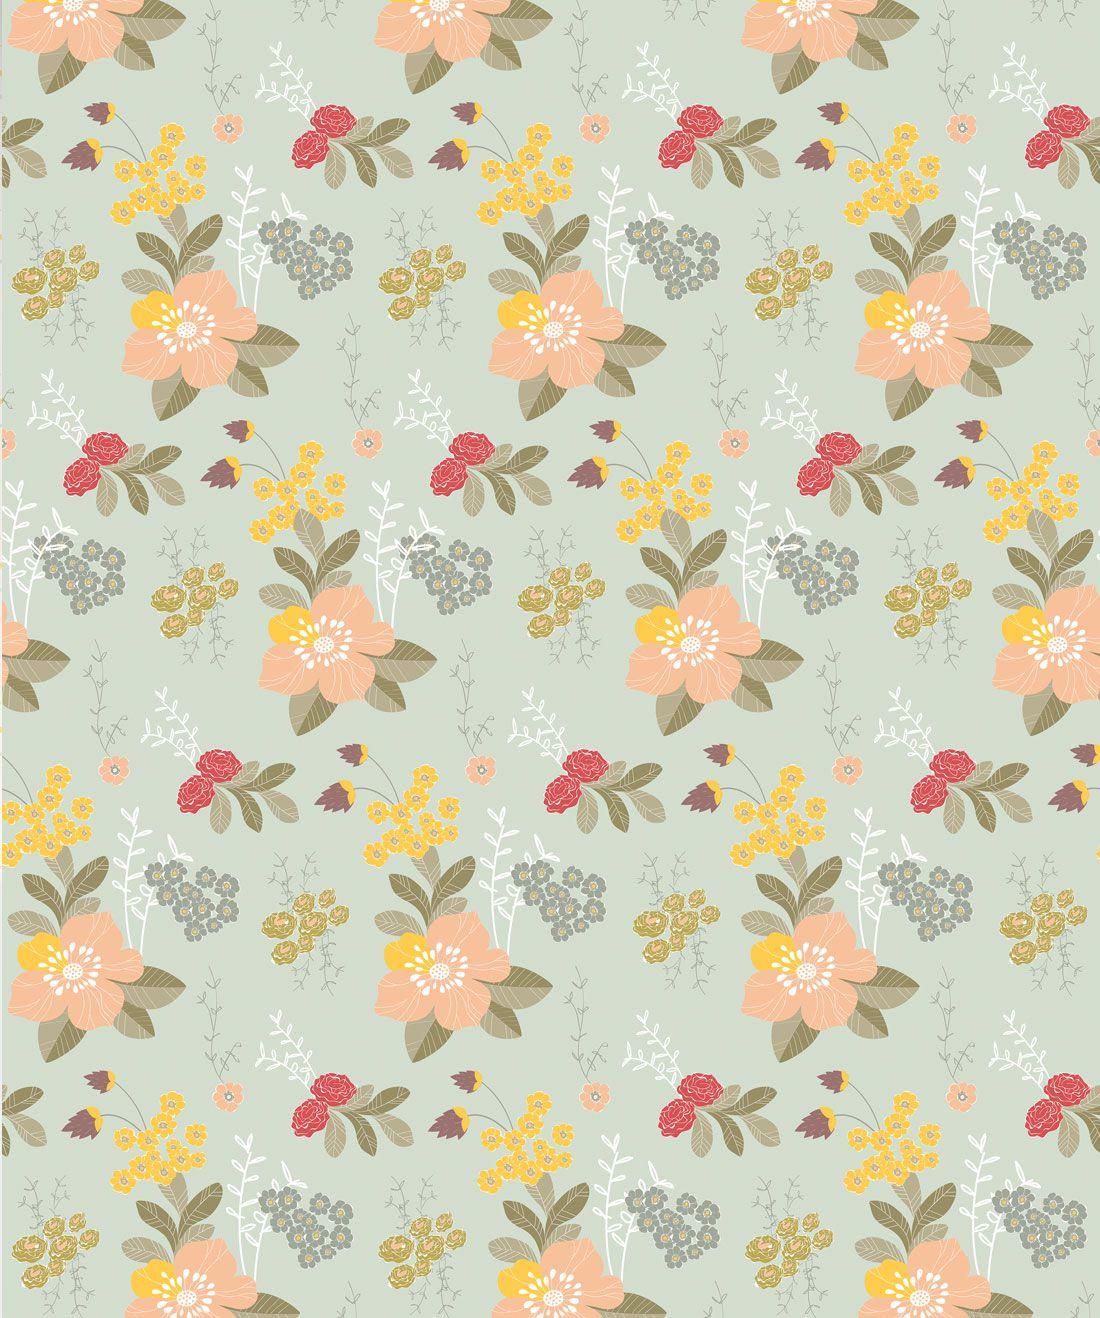 Flower Garden Wallpaper